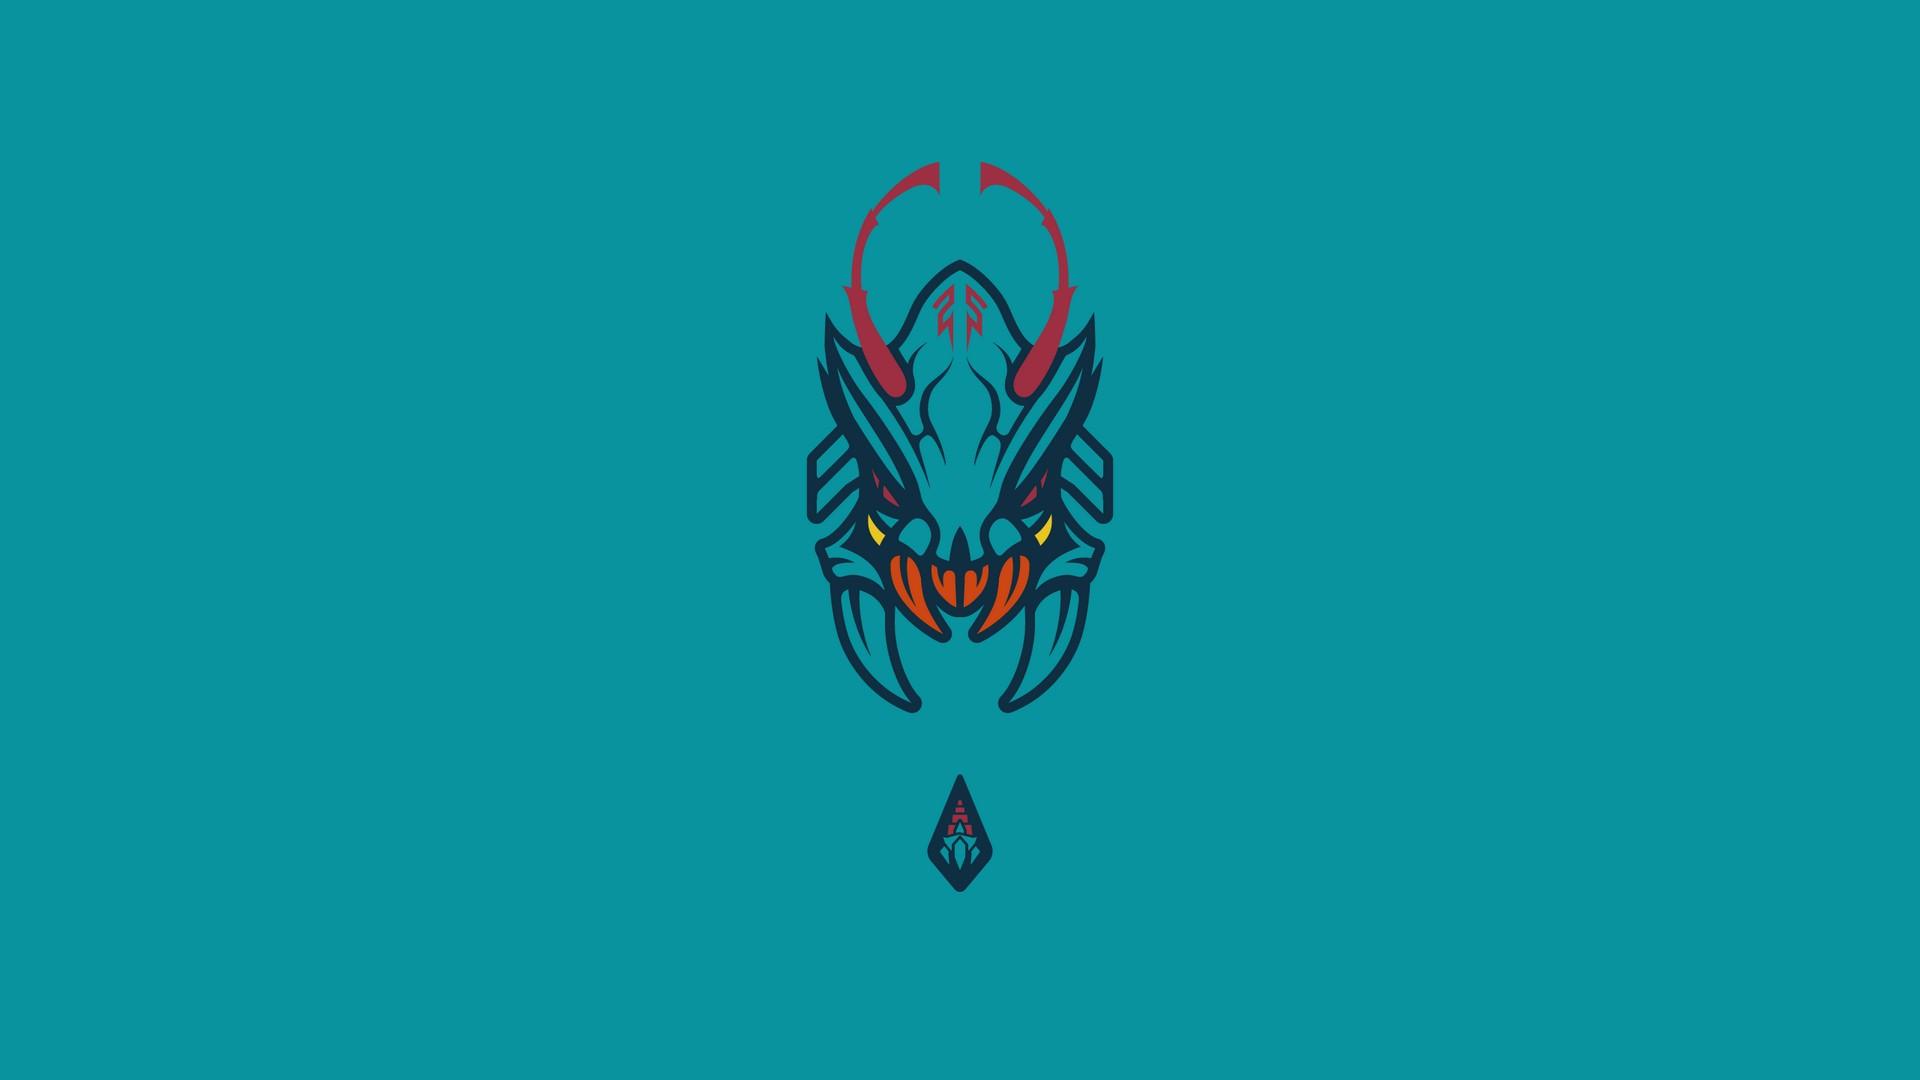 Wallpaper Illustration Video Games Minimalism Text Logo